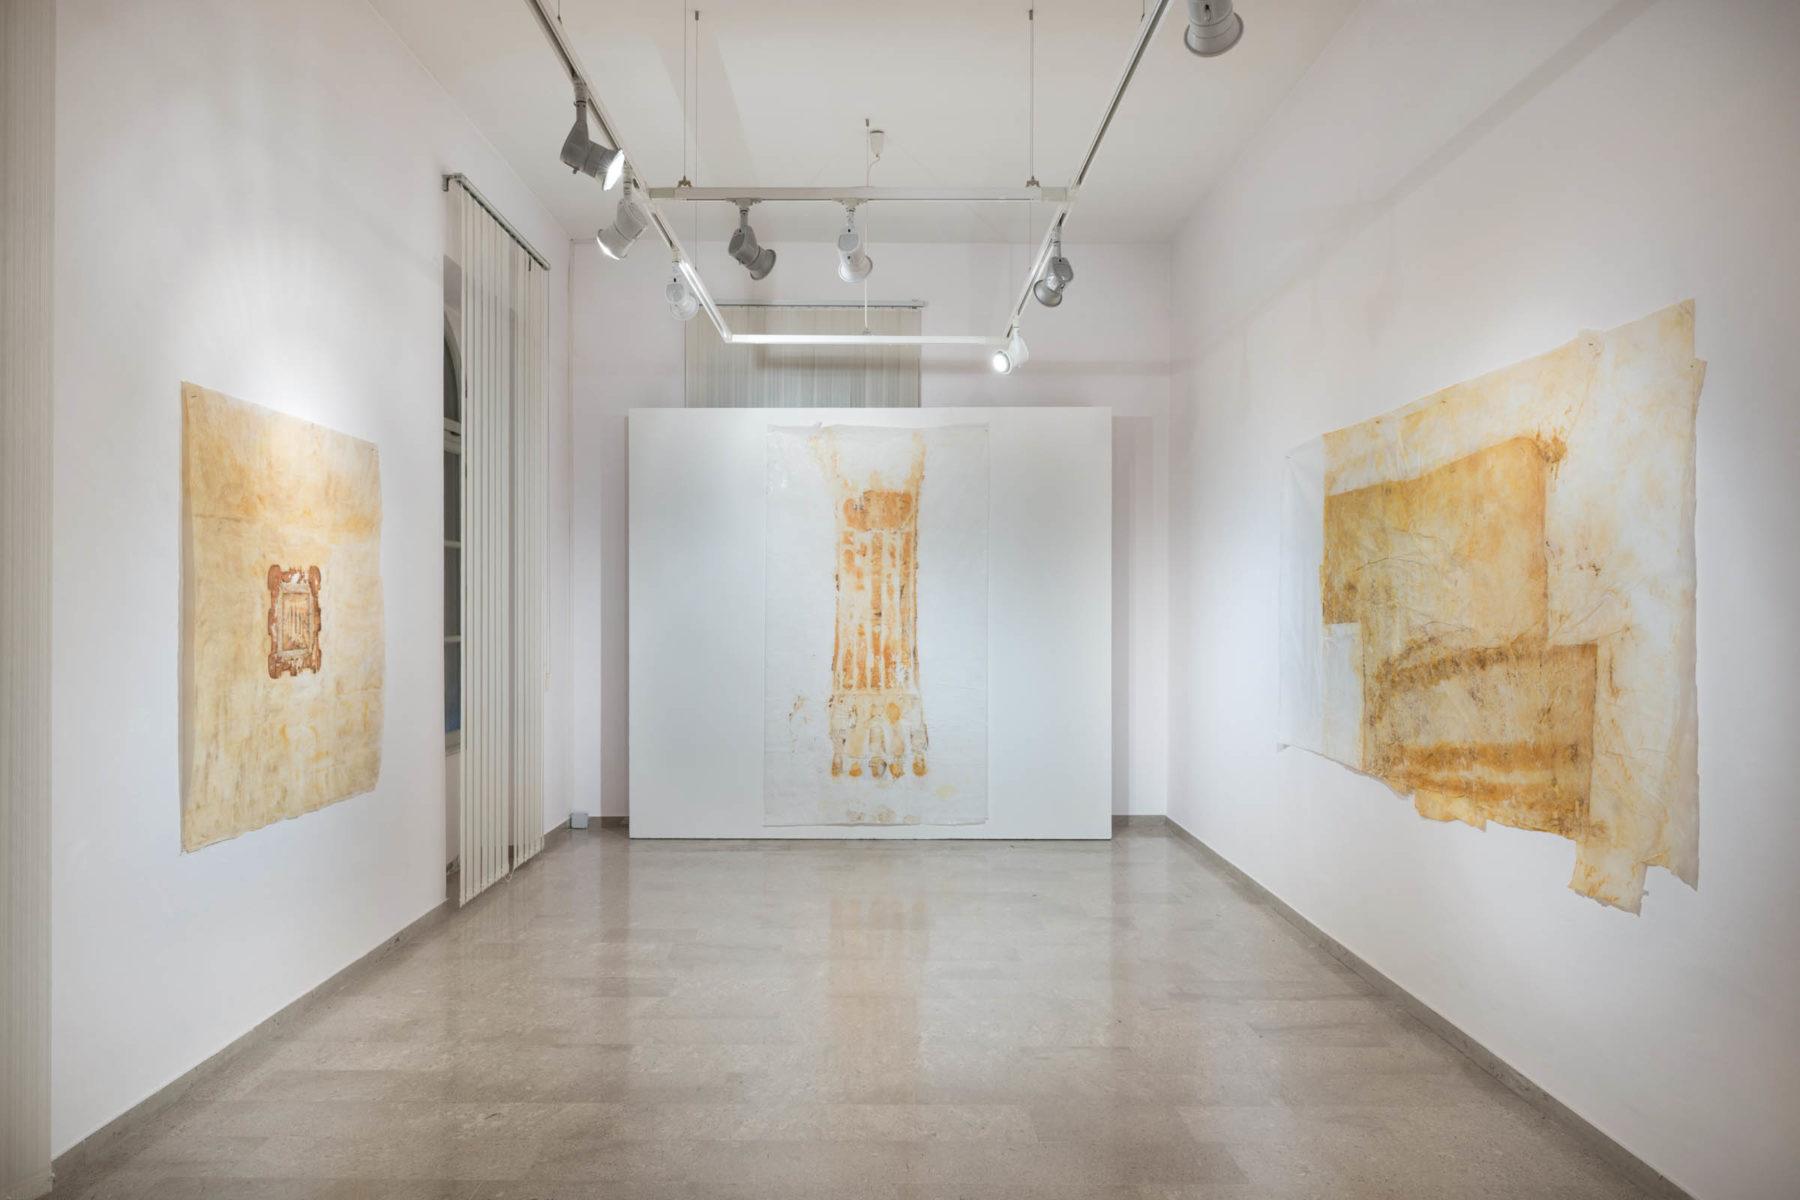 Alessandra Lazzaris, Sindone, show view, Galleria Spazzapan